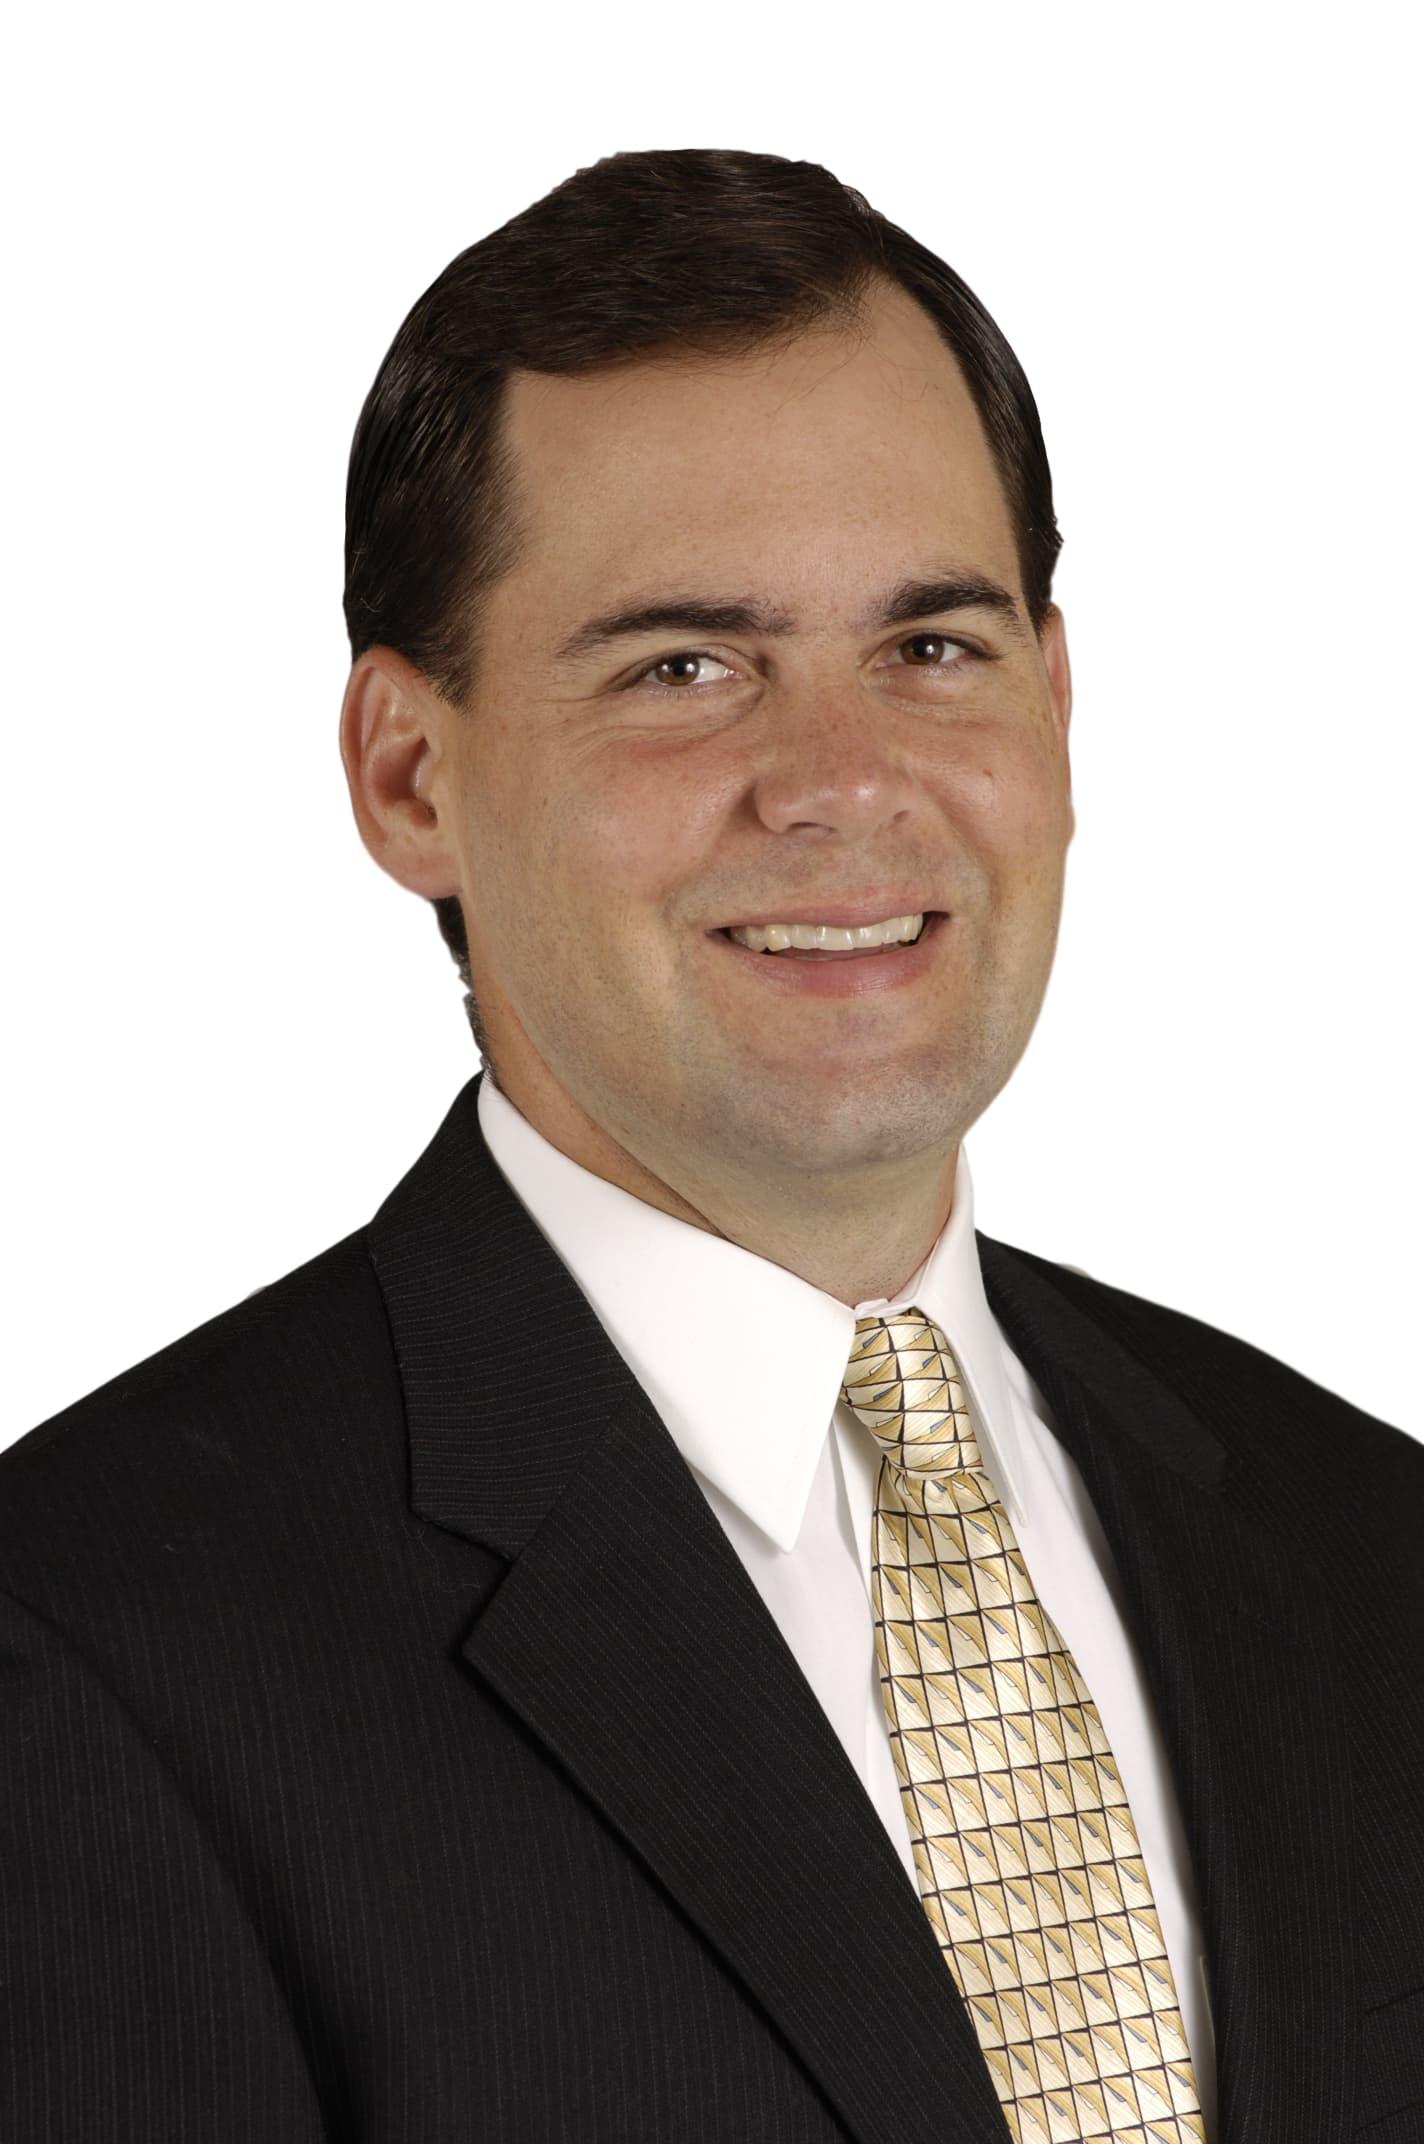 Jeff Farmer Prof Pict (002).jpg